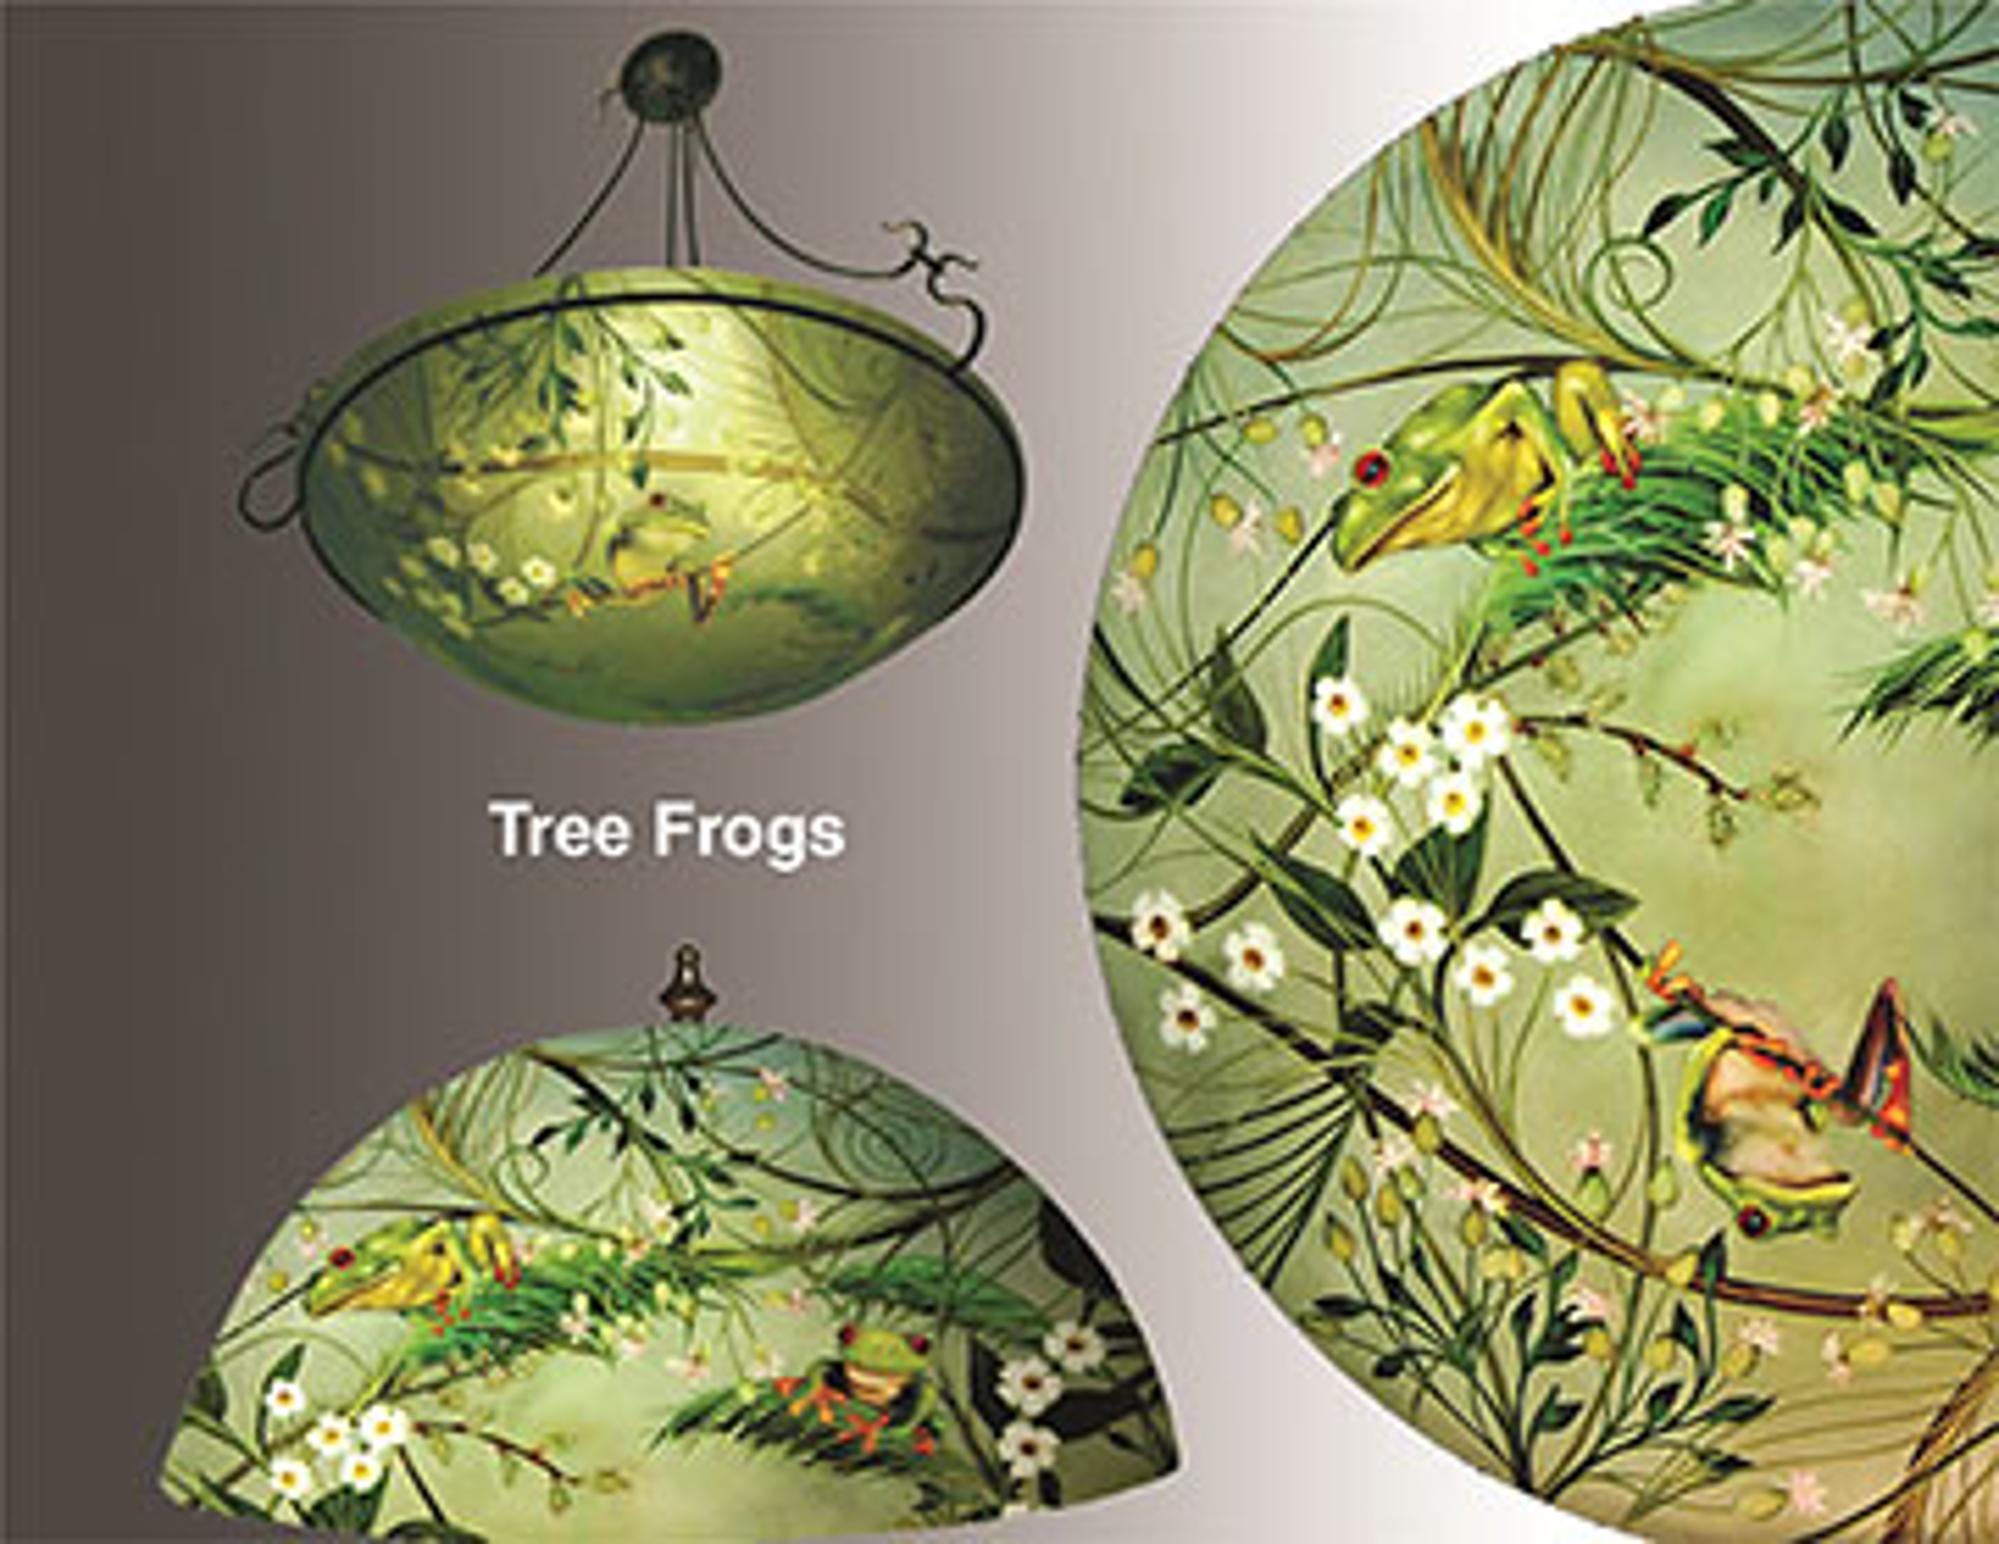 Design Tree Frogs by Jamie Barthel